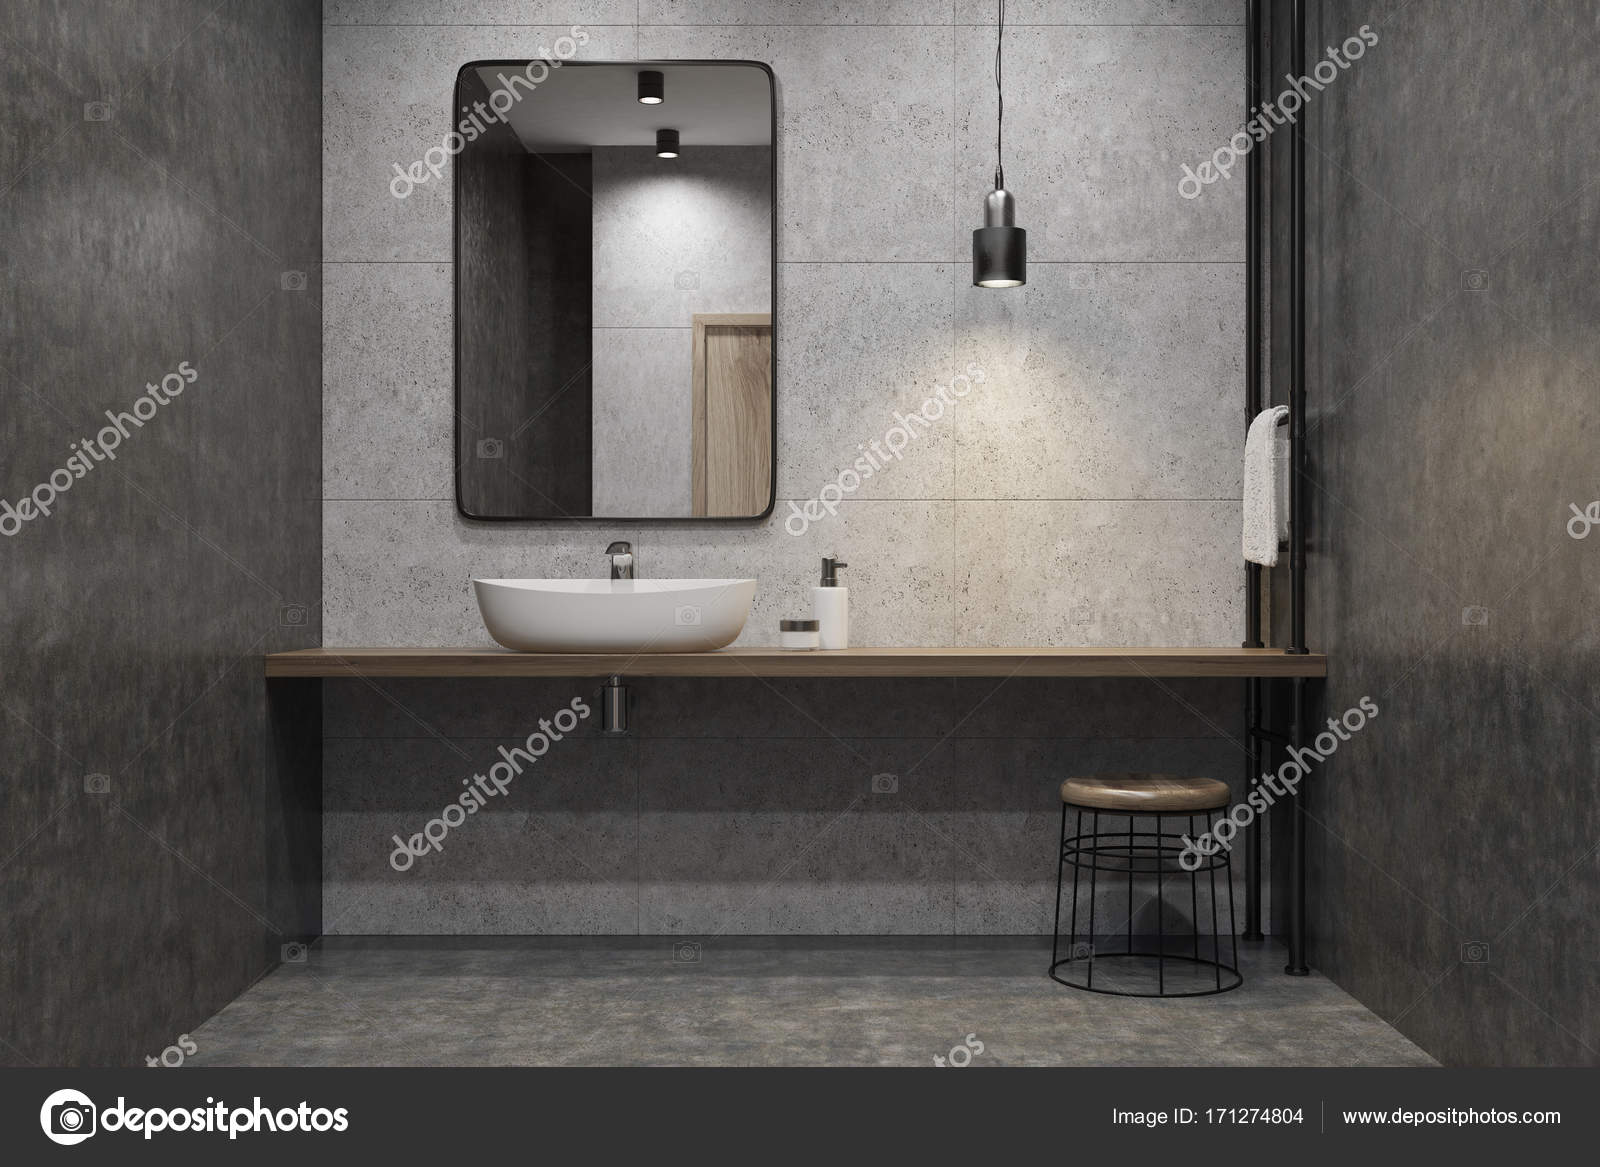 Wastafel Van Beton : Beton wc wastafel spiegel u2014 stockfoto © denisismagilov #171274804